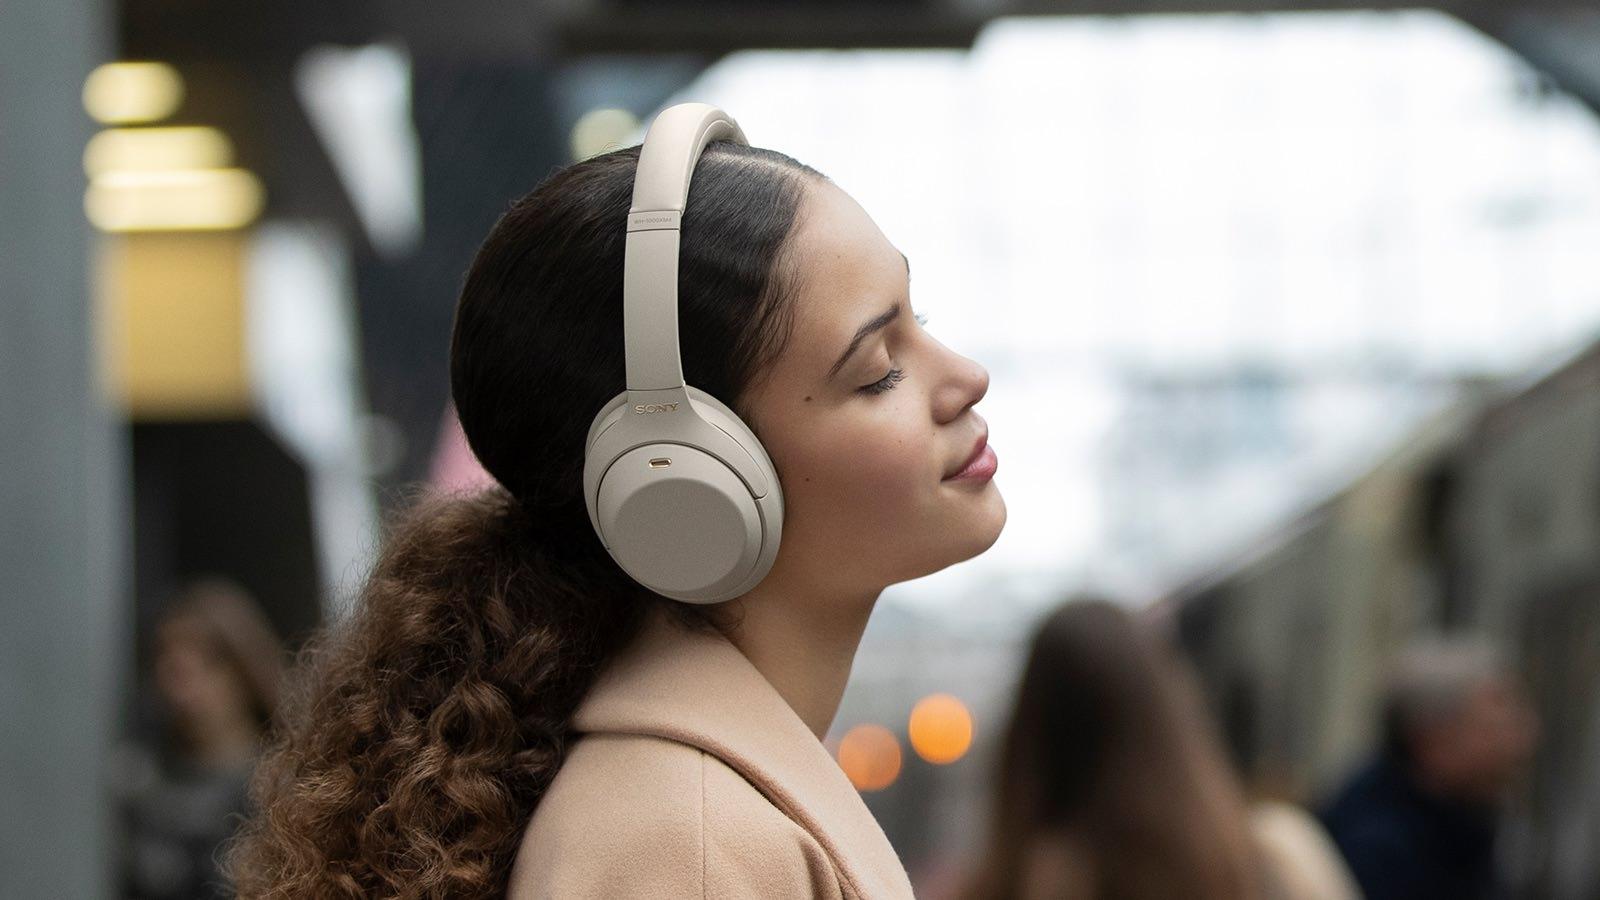 Sony WH-1000XM4 Wireless Noise Canceling Headphones on woman